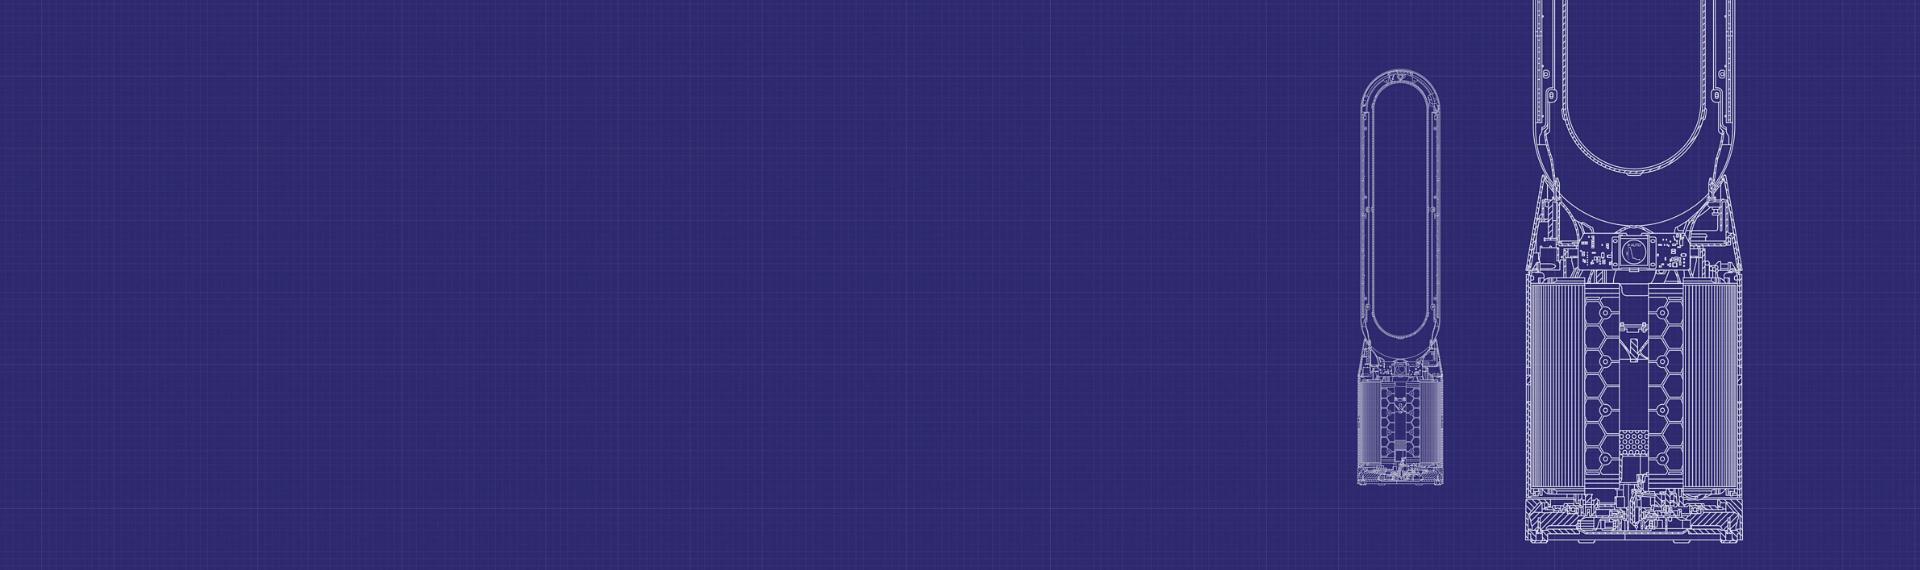 Dyson purifiers line drawings